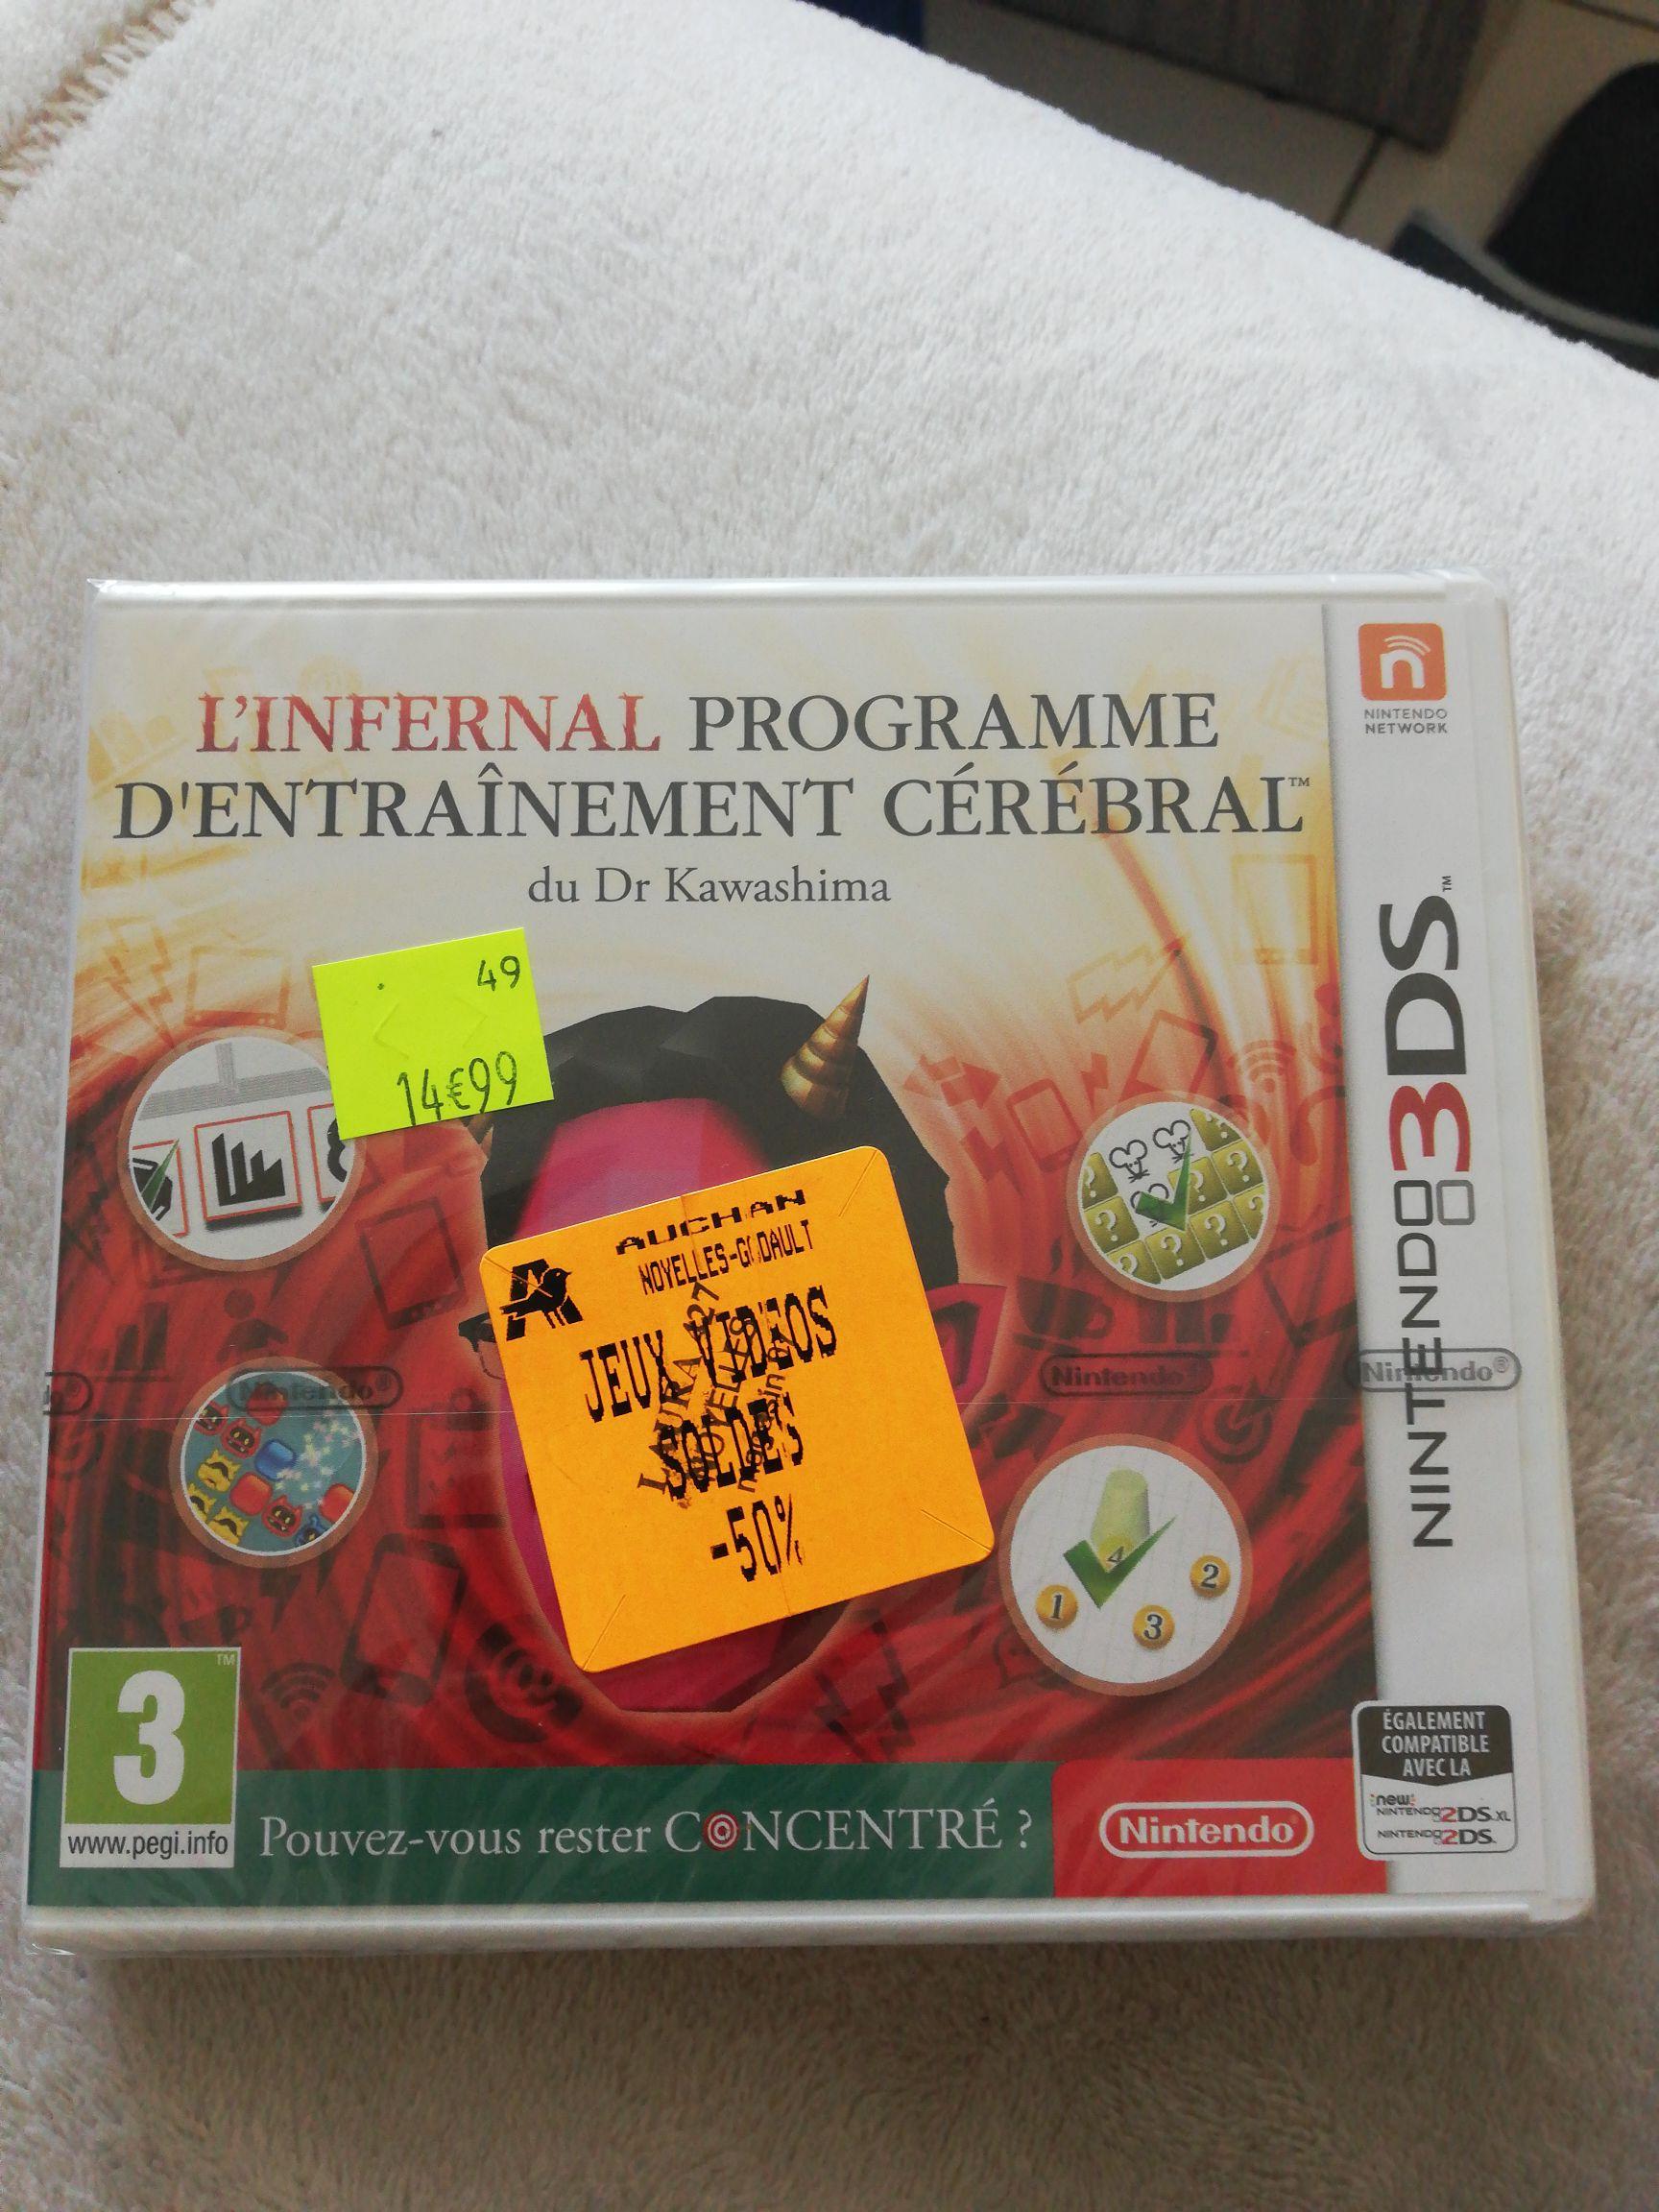 L'infernal programme d'entraînement cérébral du Dr Kawashima sur Nintendo 3DS (Noyelles-Godault 62)